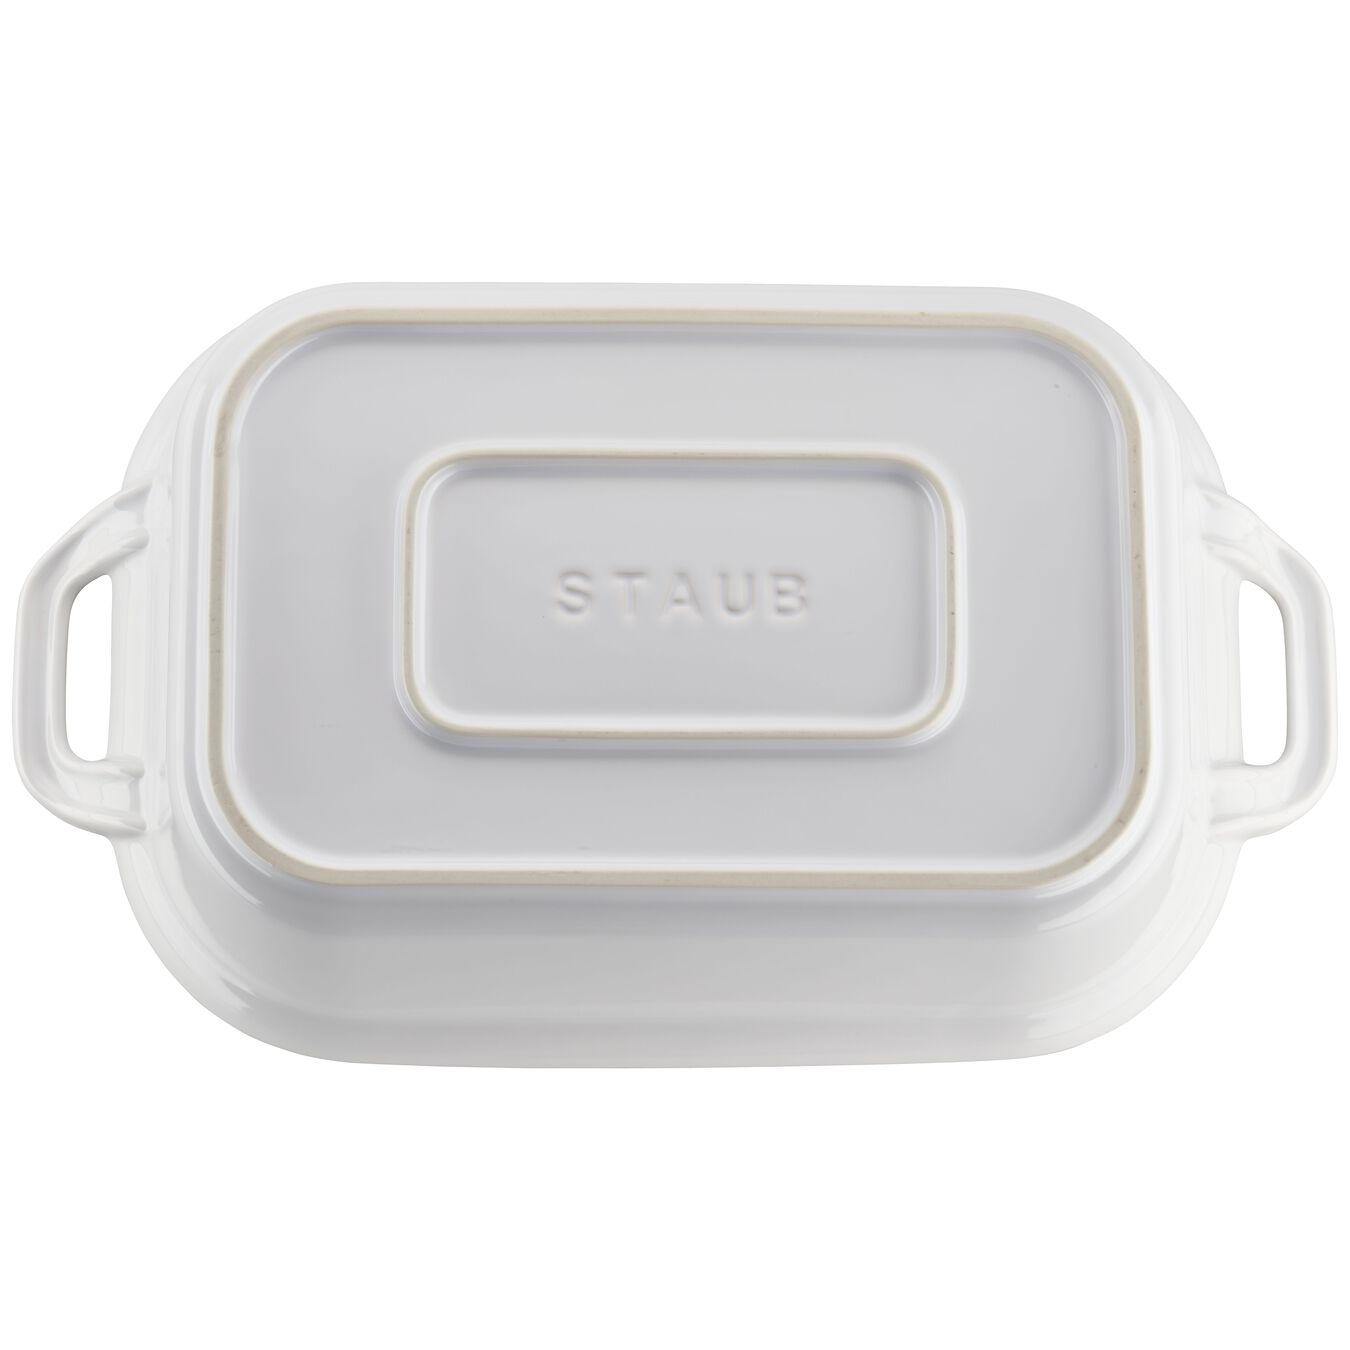 12-inch x 8-inch Rectangular Covered Baking Dish - White,,large 5